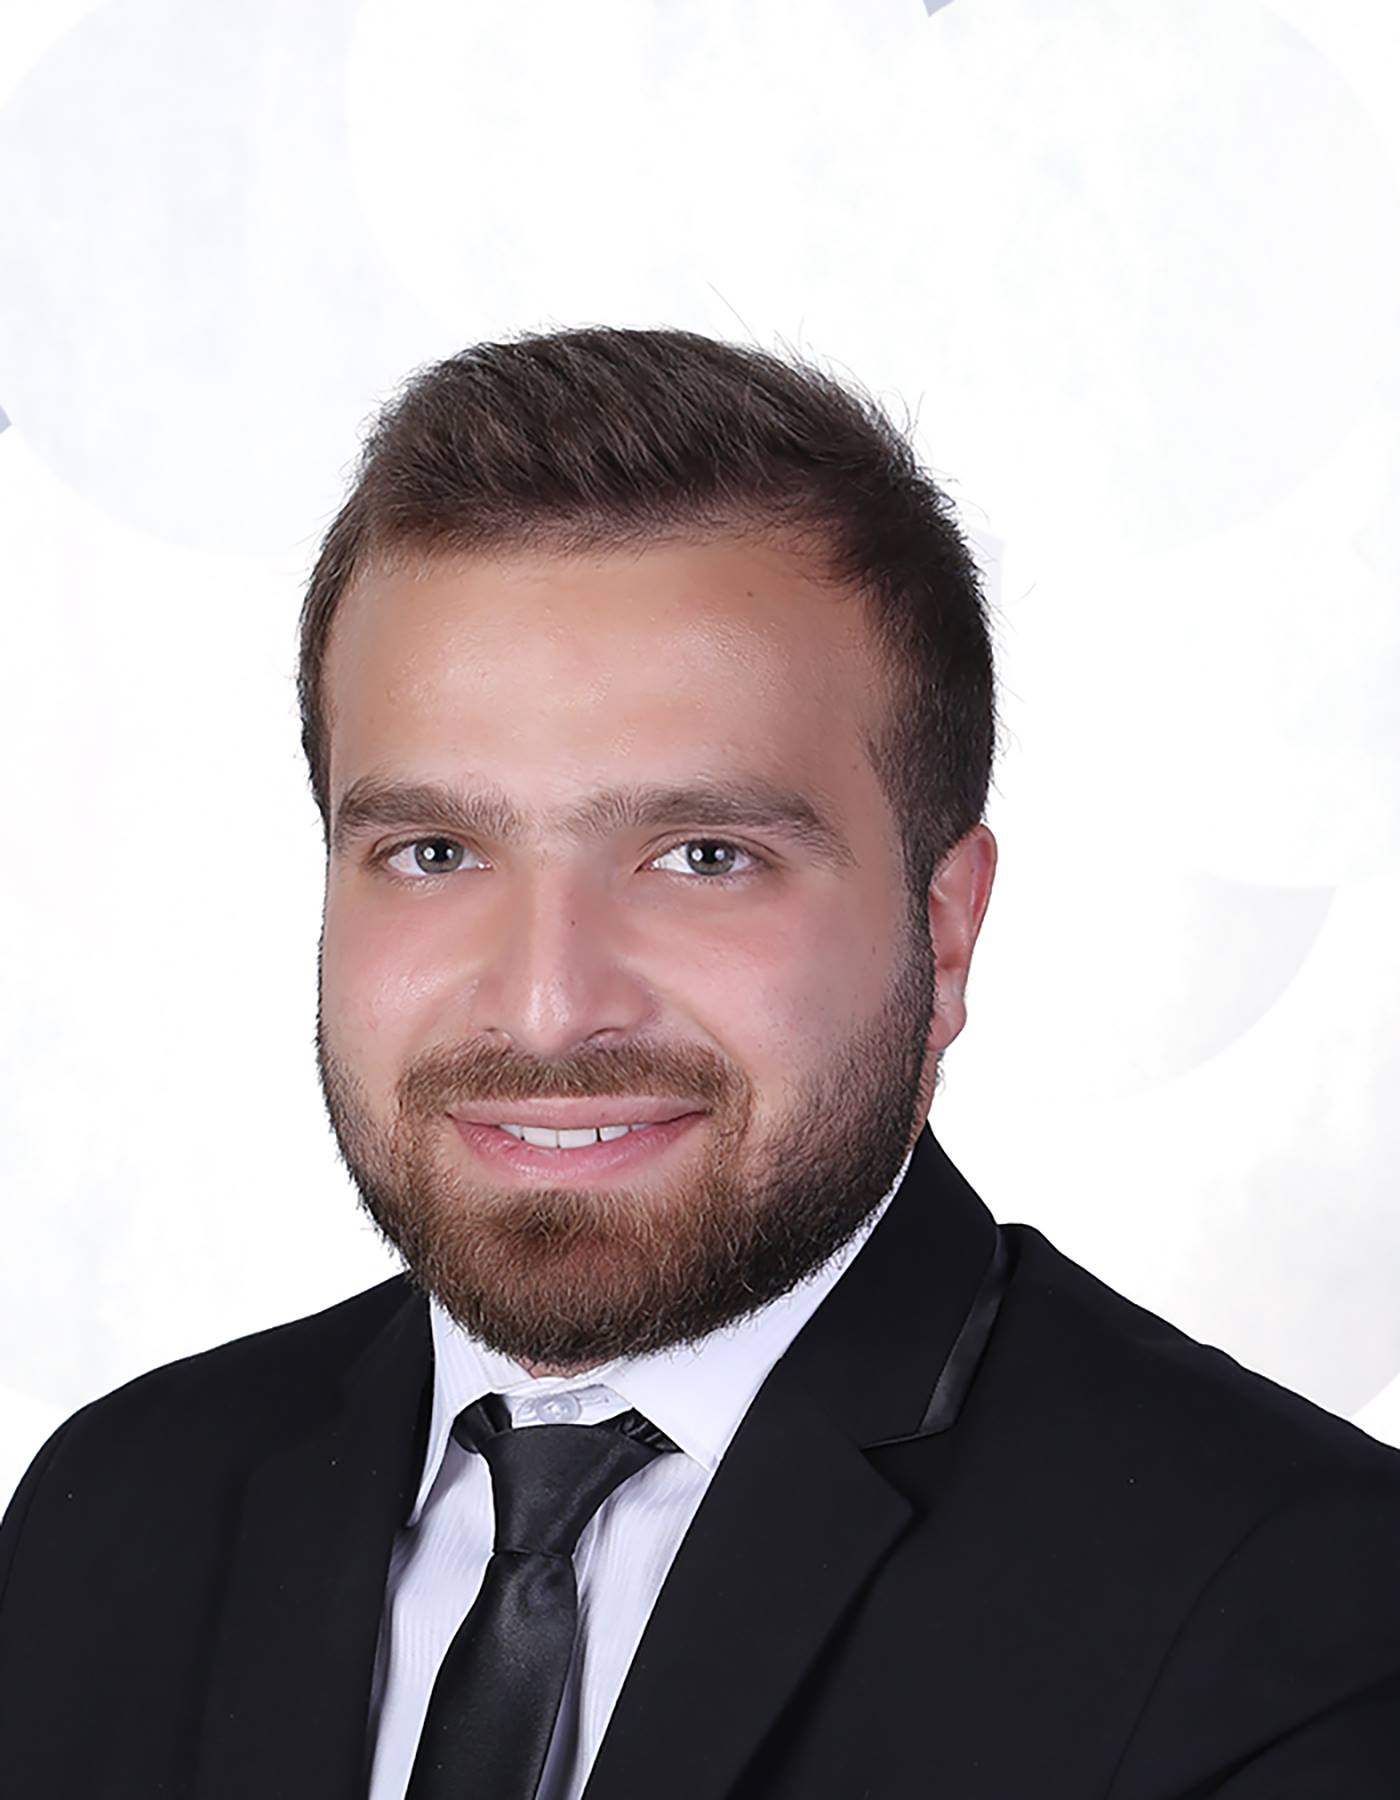 Хамад Аззам Нассер